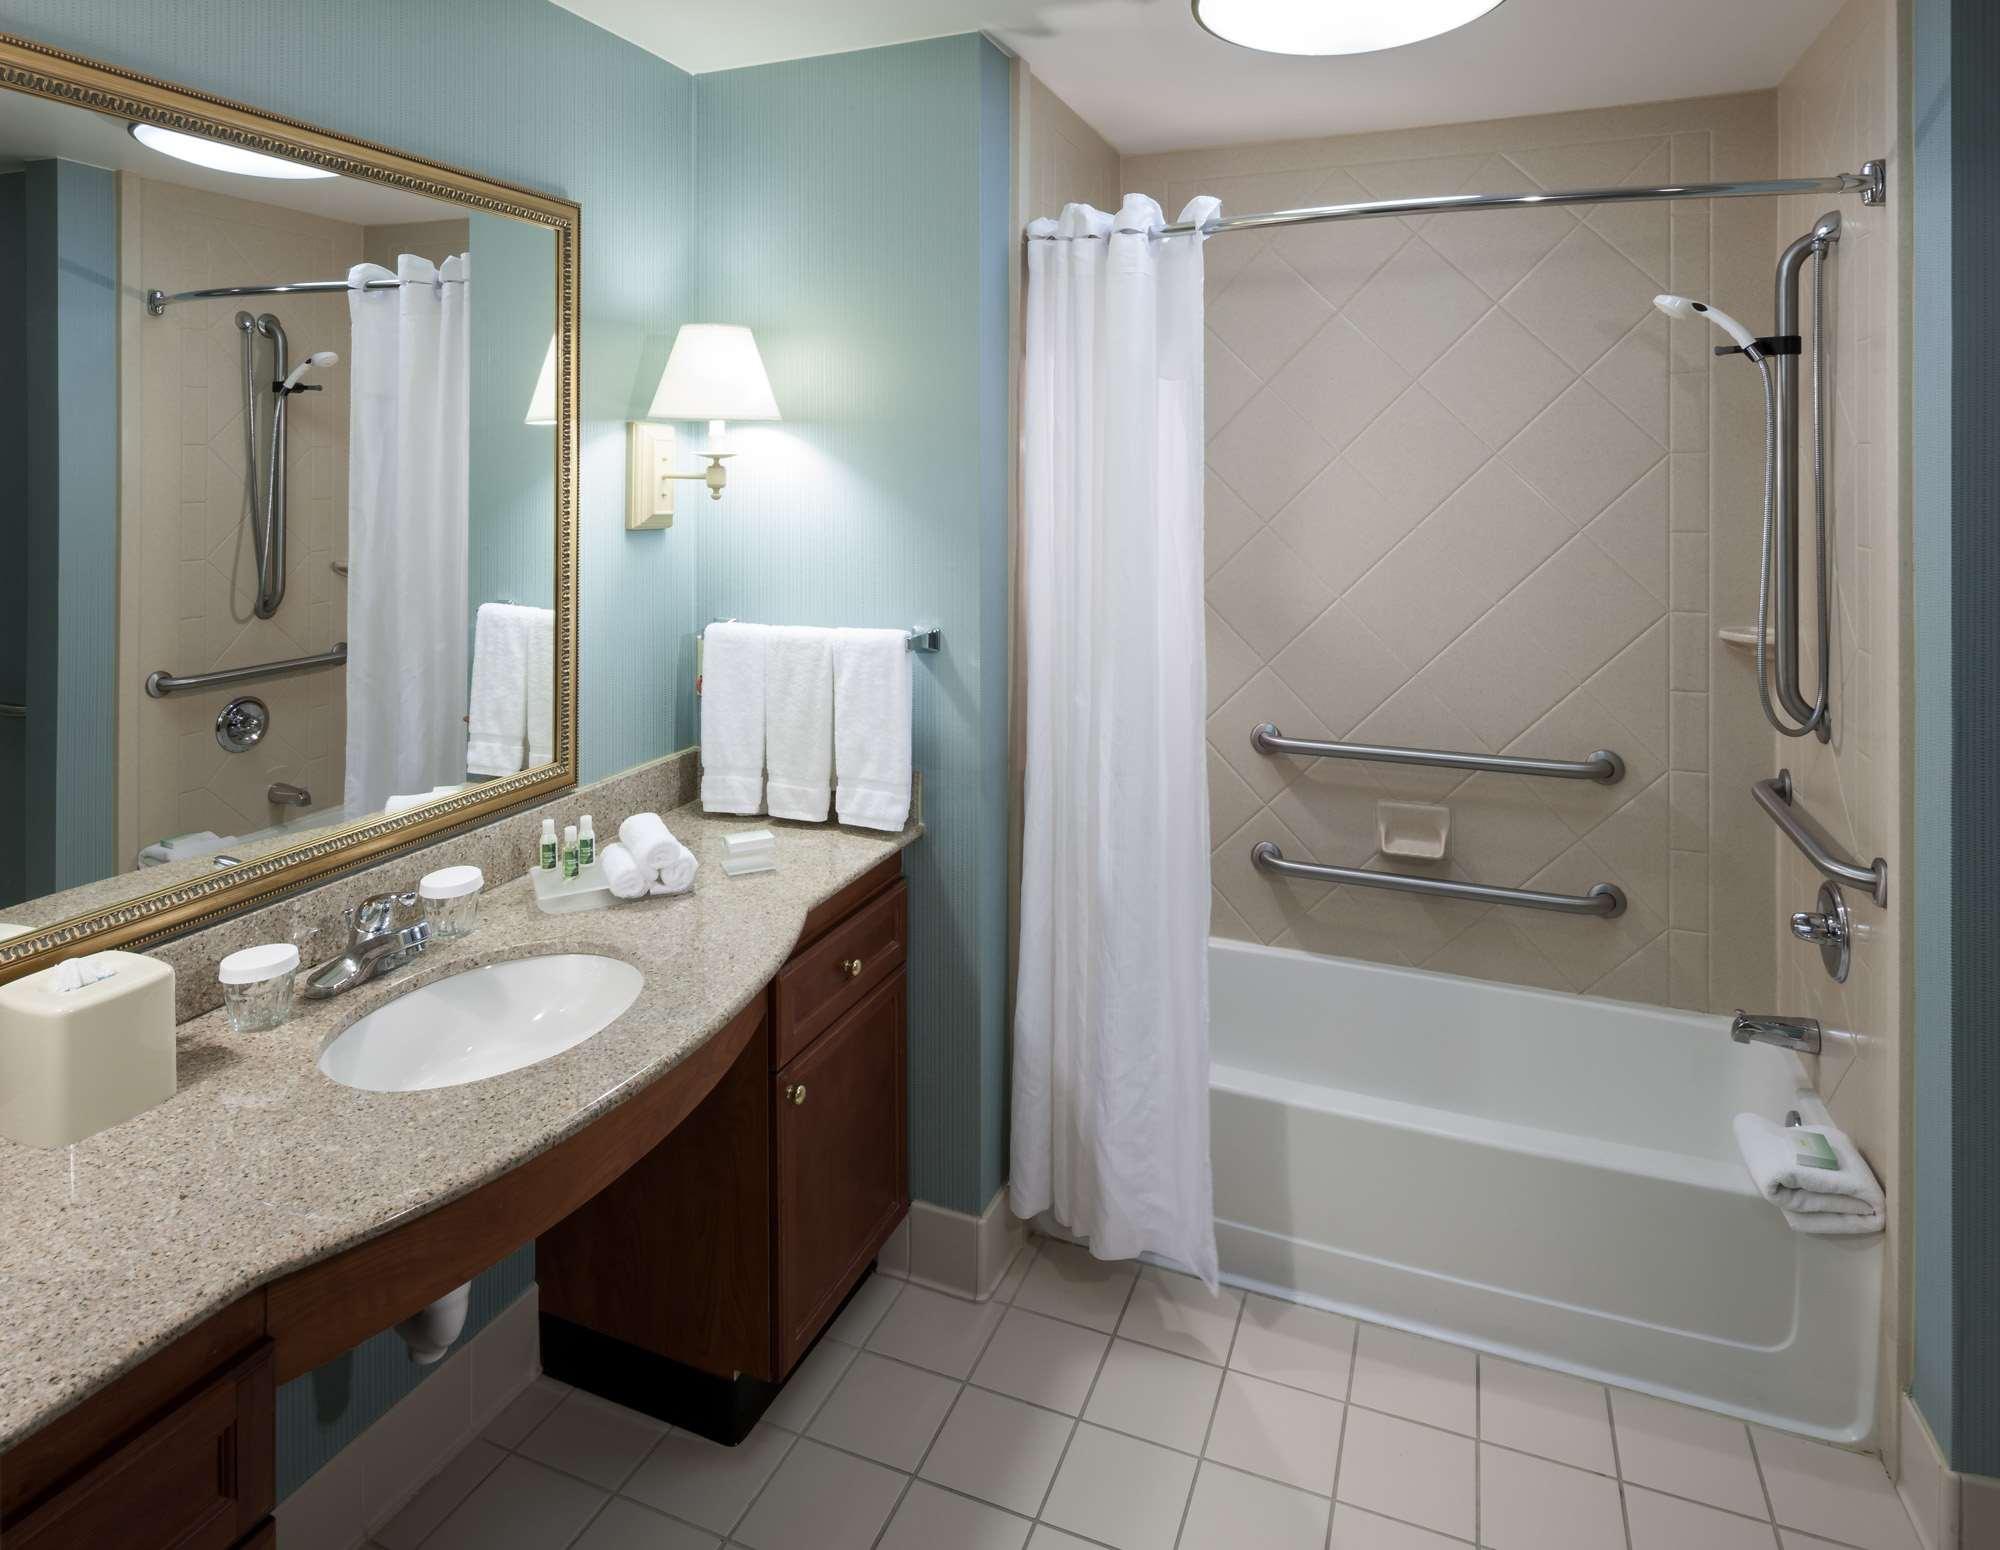 Homewood Suites by Hilton Philadelphia/Mt. Laurel image 9